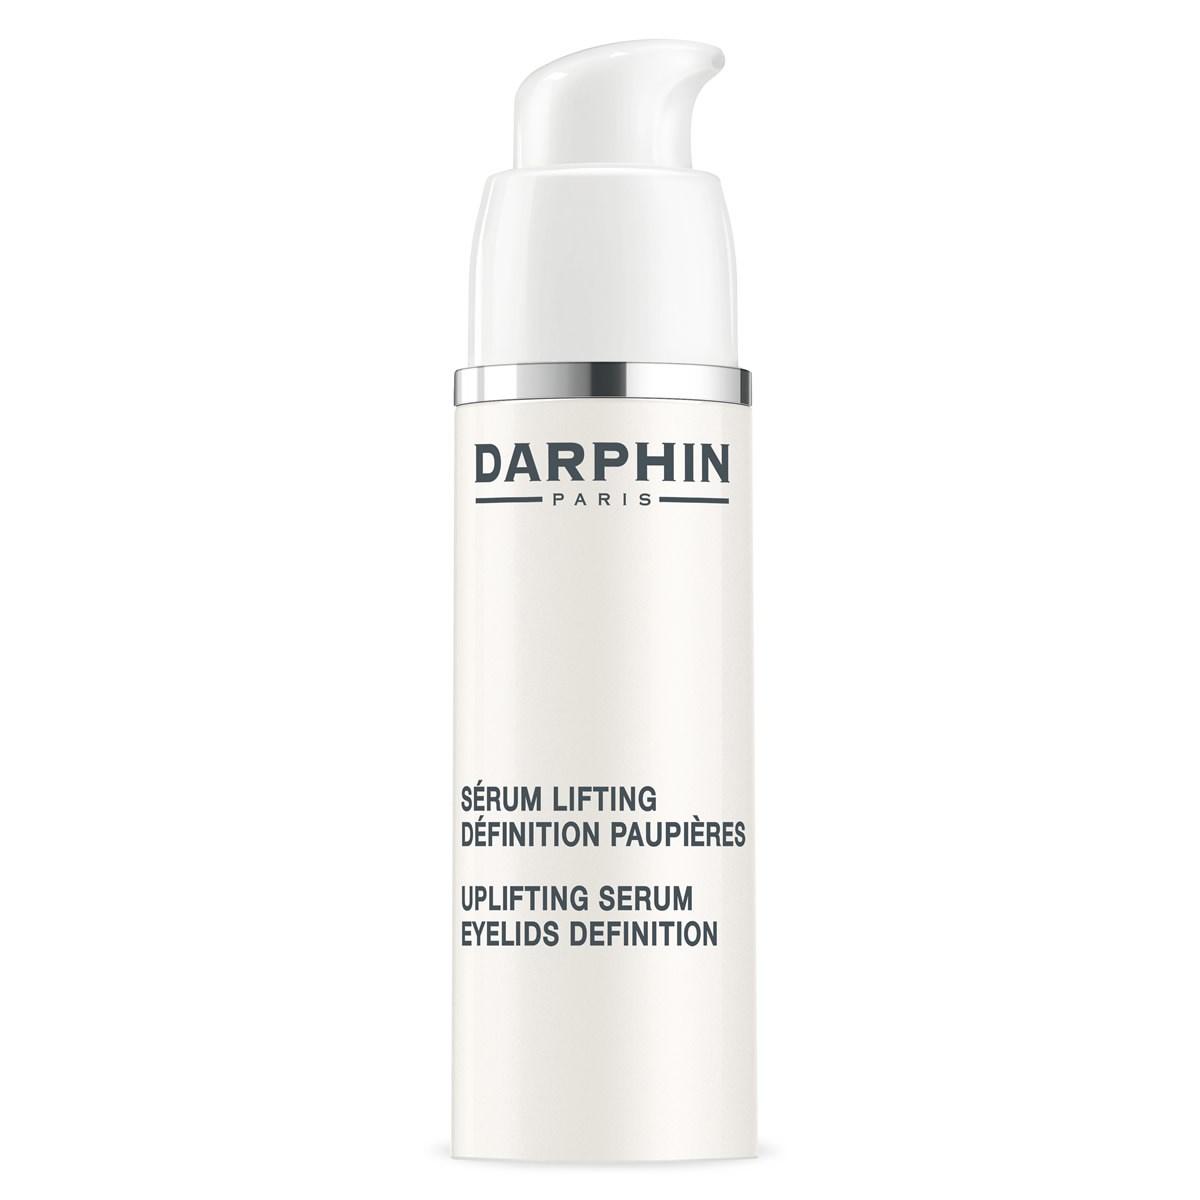 Darphin Eye Care Uplifting Serum Eyelids Definition